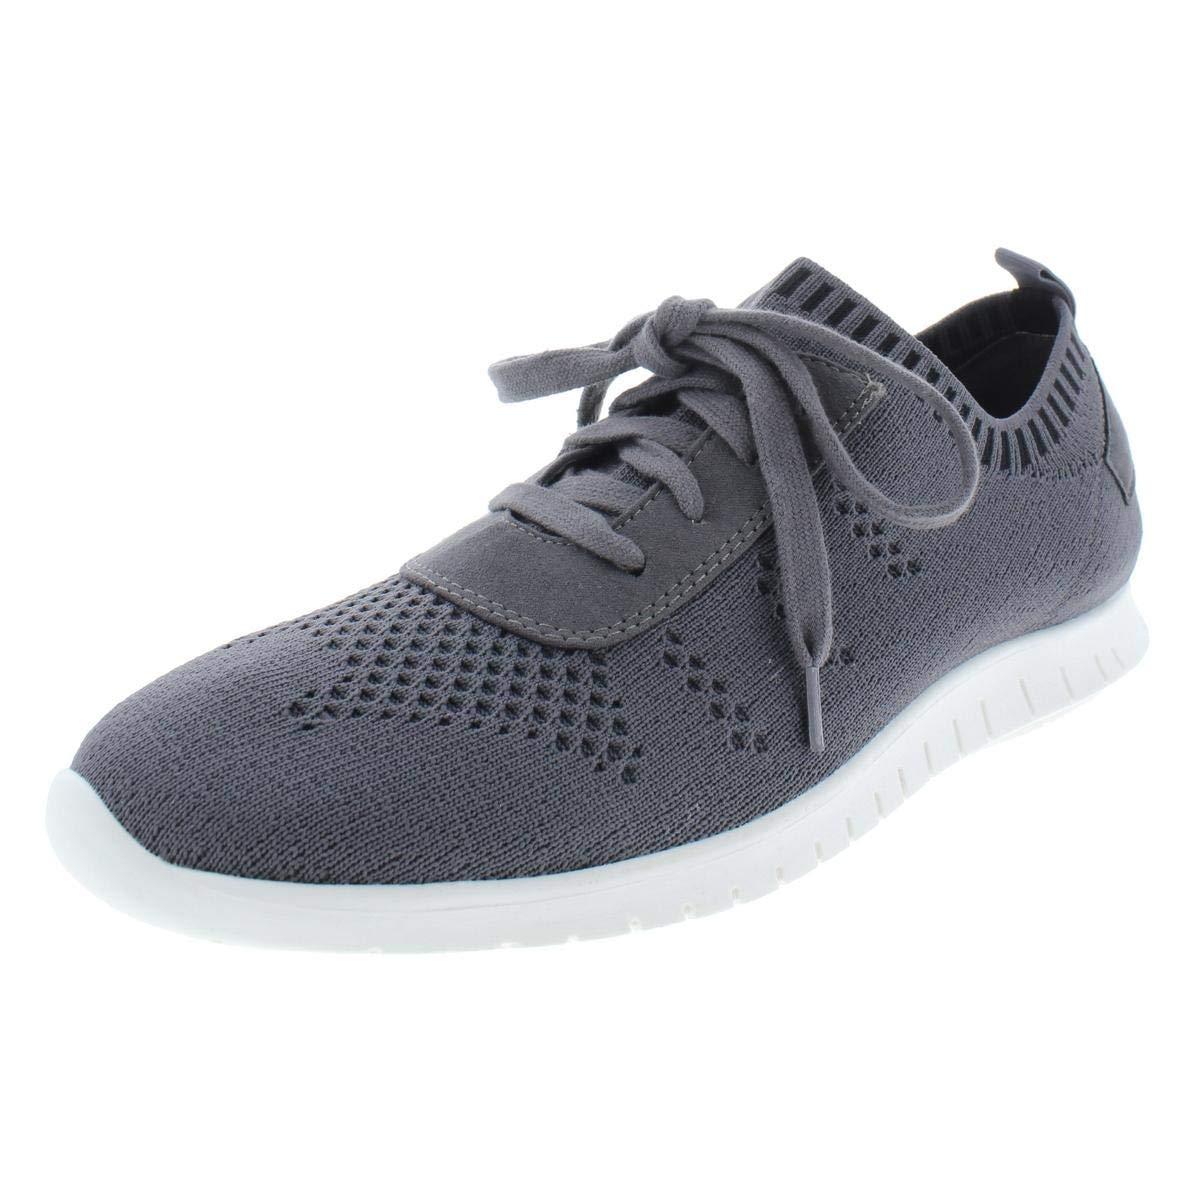 0b5f8c3a54e Steve madden womens kader knit sneakers athletic shoes gray medium shoes  handbags jpg 1200x1200 Steve madden